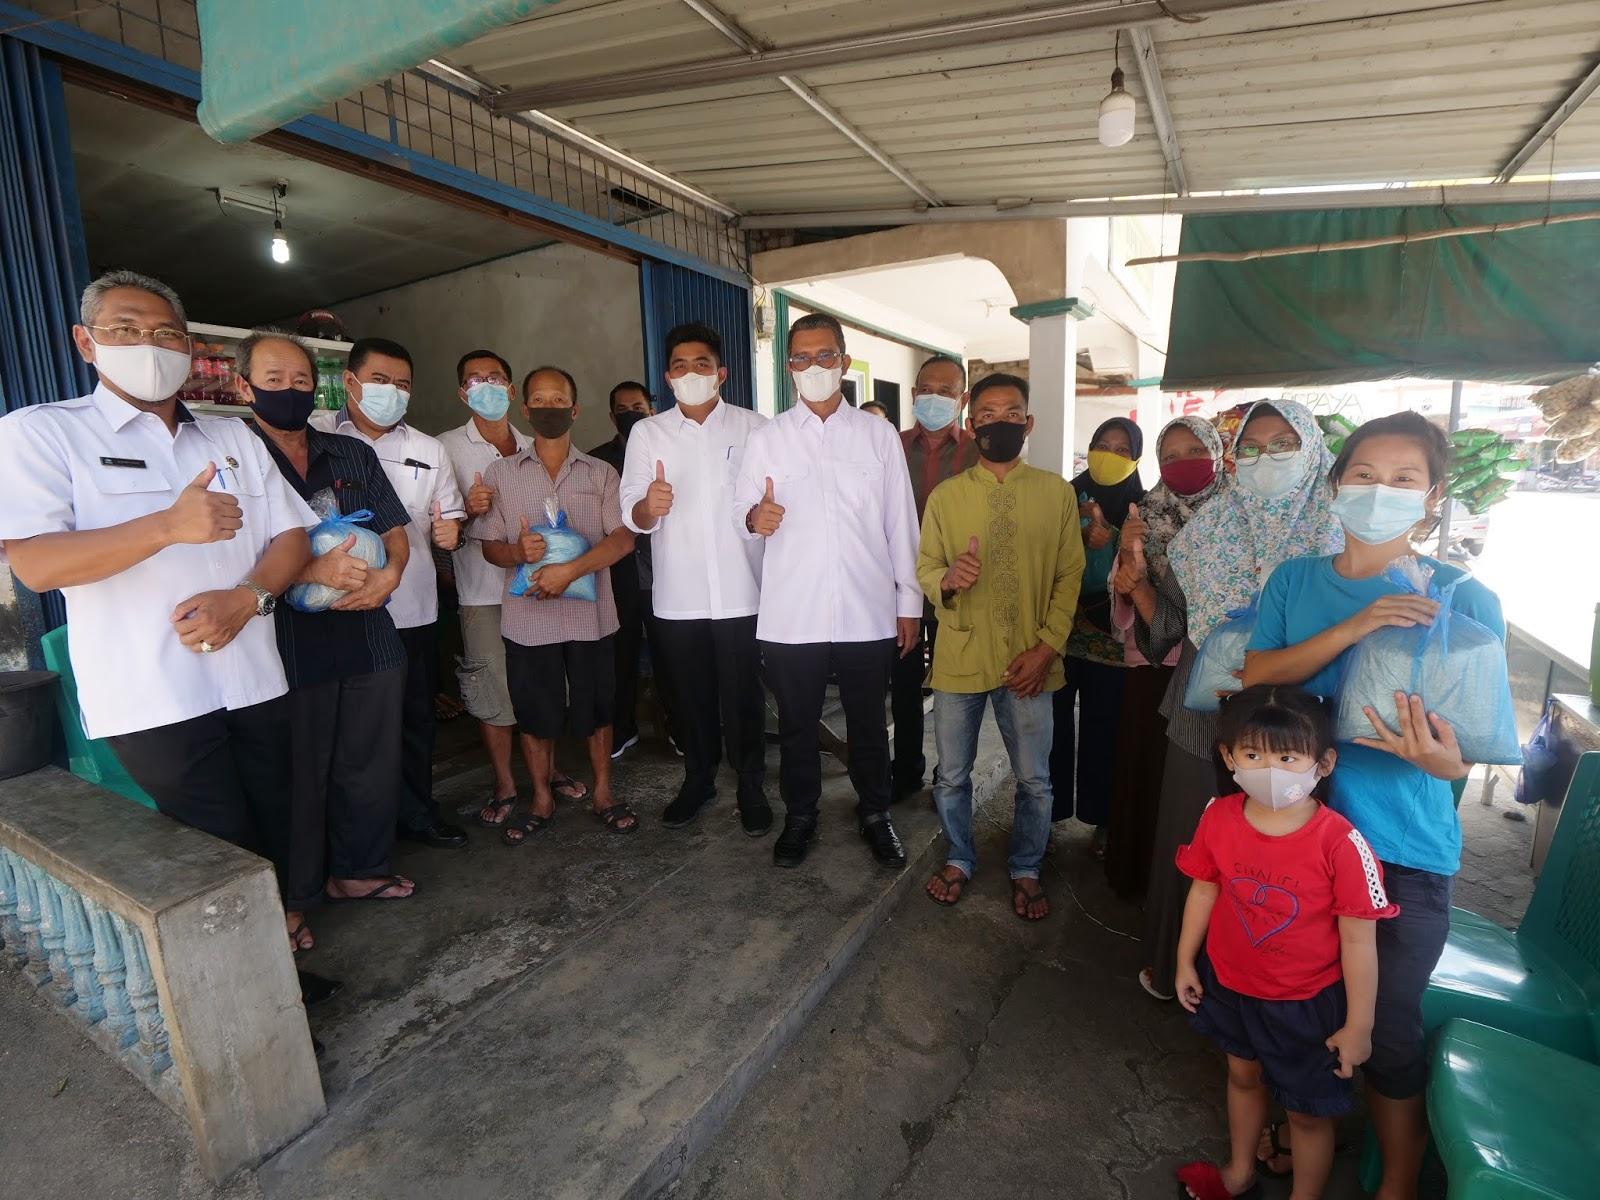 Sambangi Pedagang Kecil di Kawal, Apri dan Roby Sosialisasikan Bantuan Stimulus Tanpa Bunga Bagi Pelaku UMKM